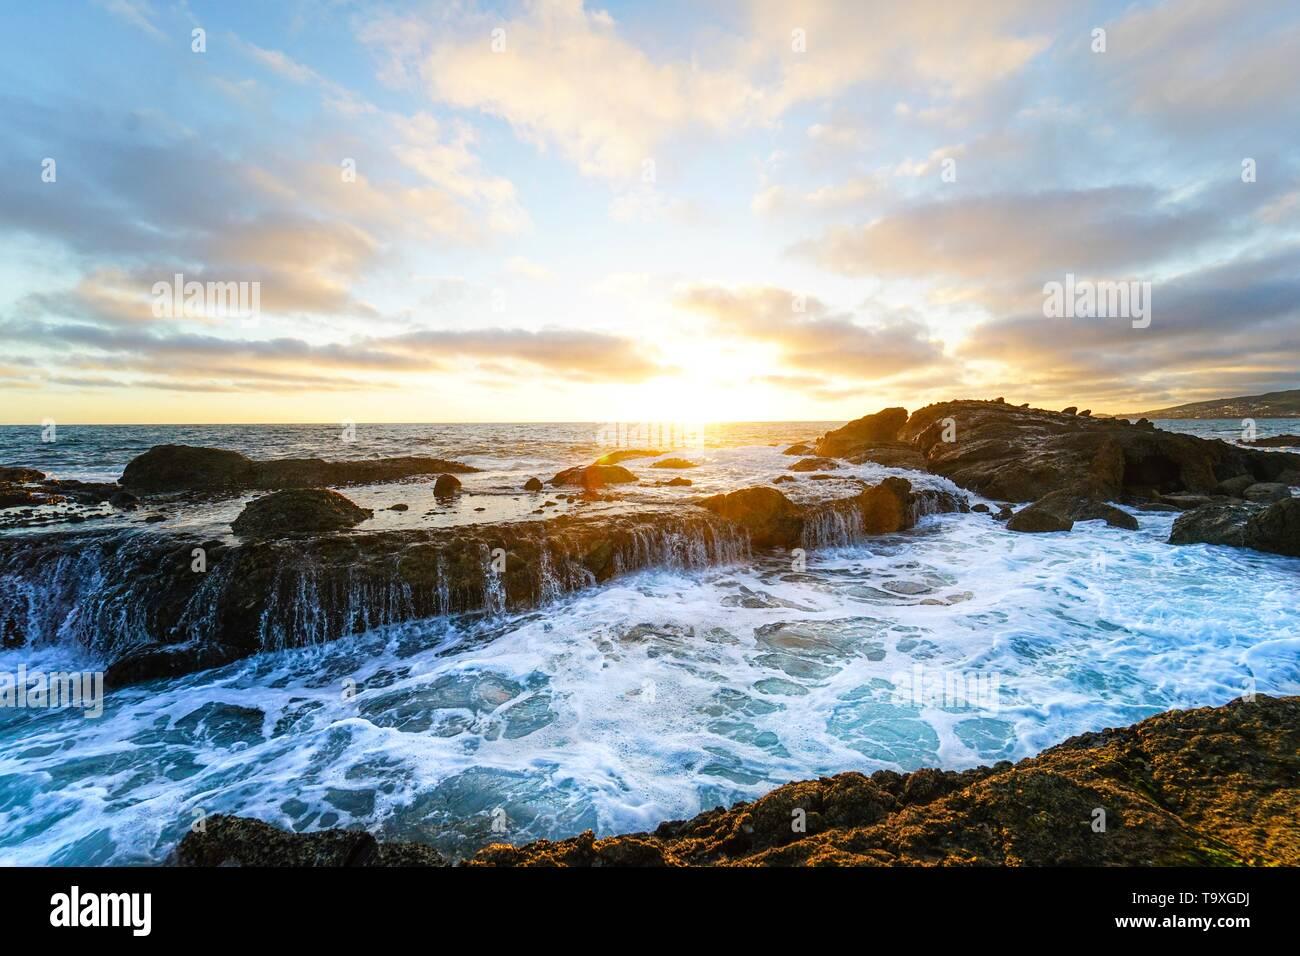 A beautiful sunset taken from a tidepool in Laguna Beach, California. - Stock Image